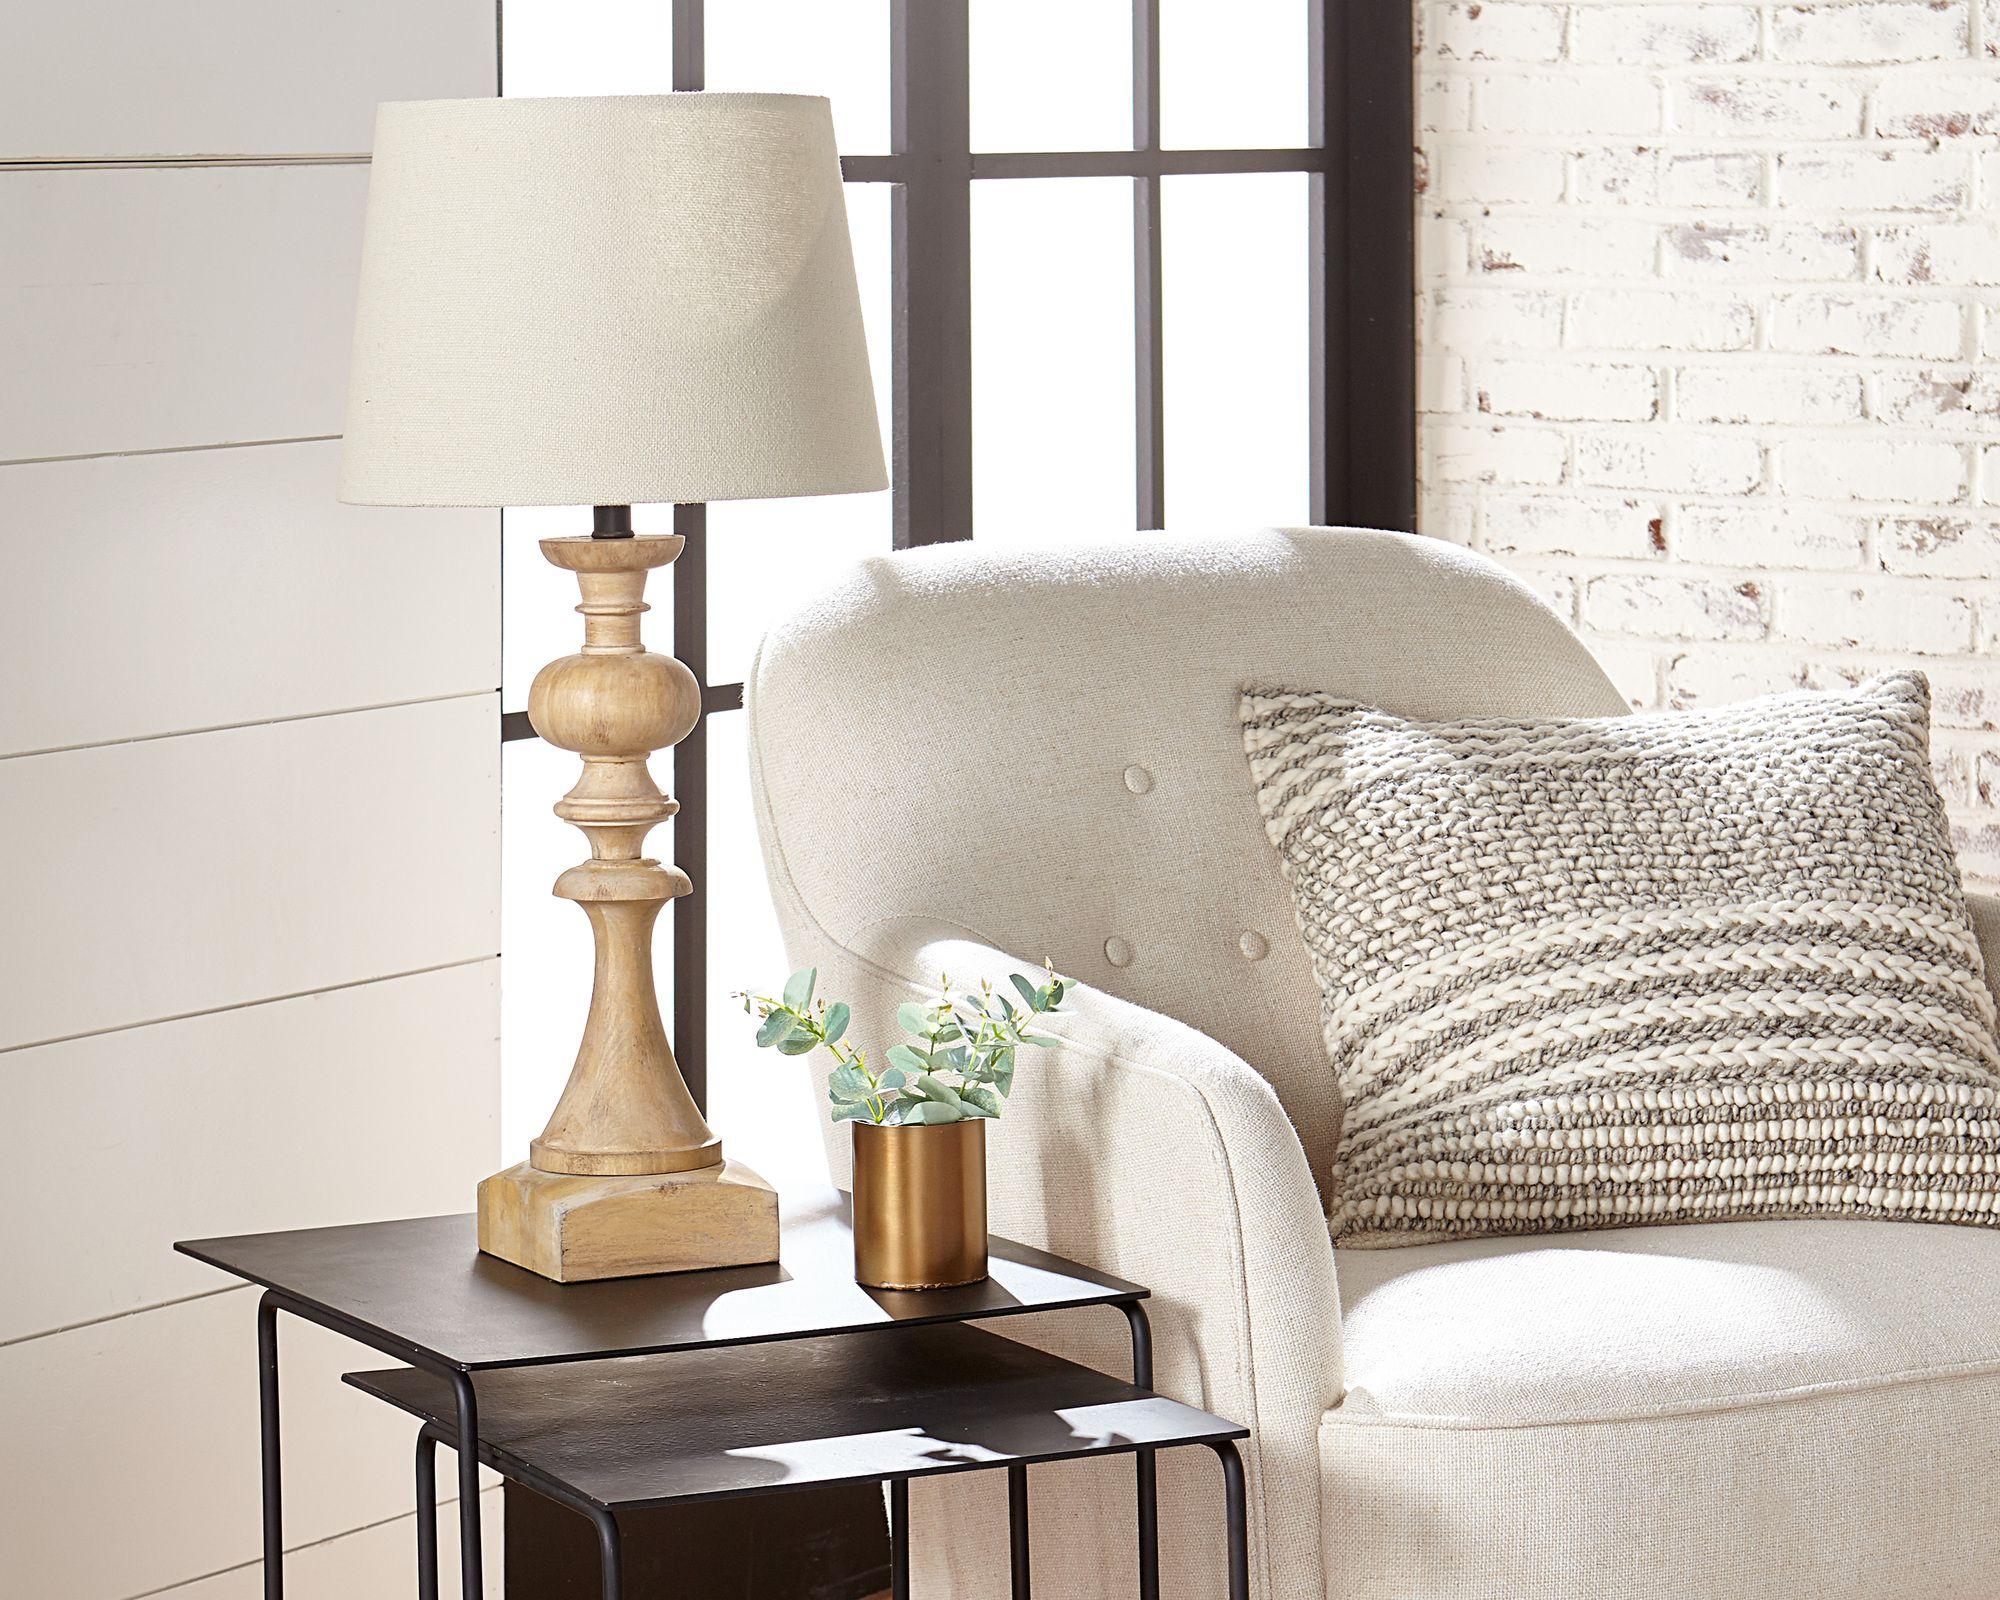 Wood Primitive Table Lamp Magnolia Home Primitive